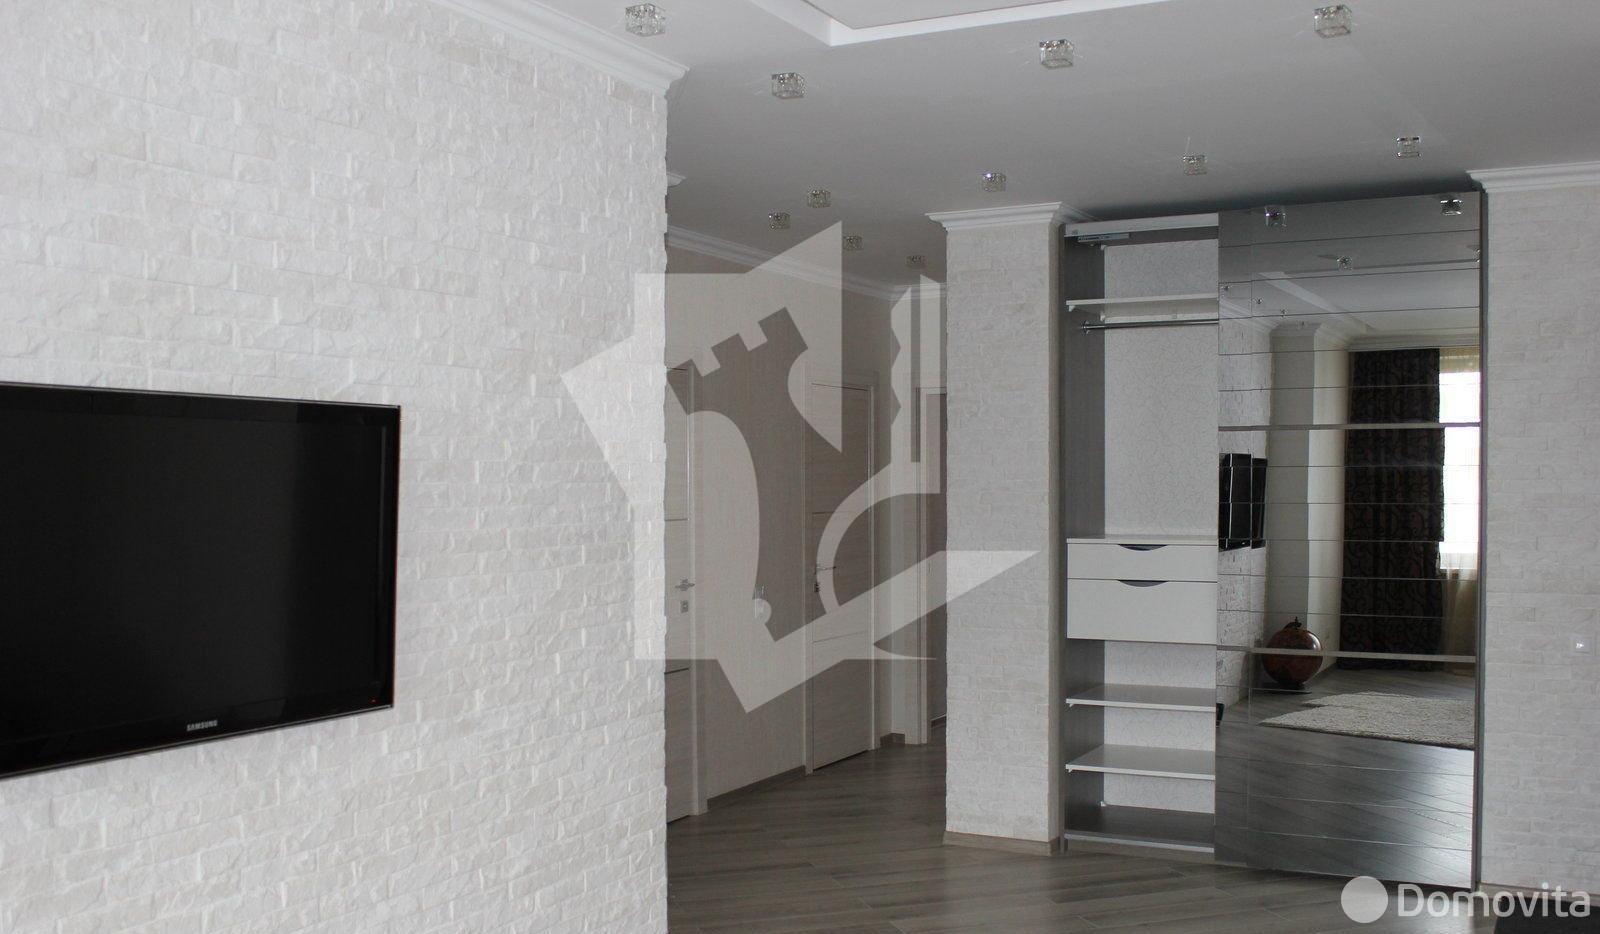 Снять 2-комнатную квартиру в Минске, ул. Скрыганова, д. 4Б - фото 3